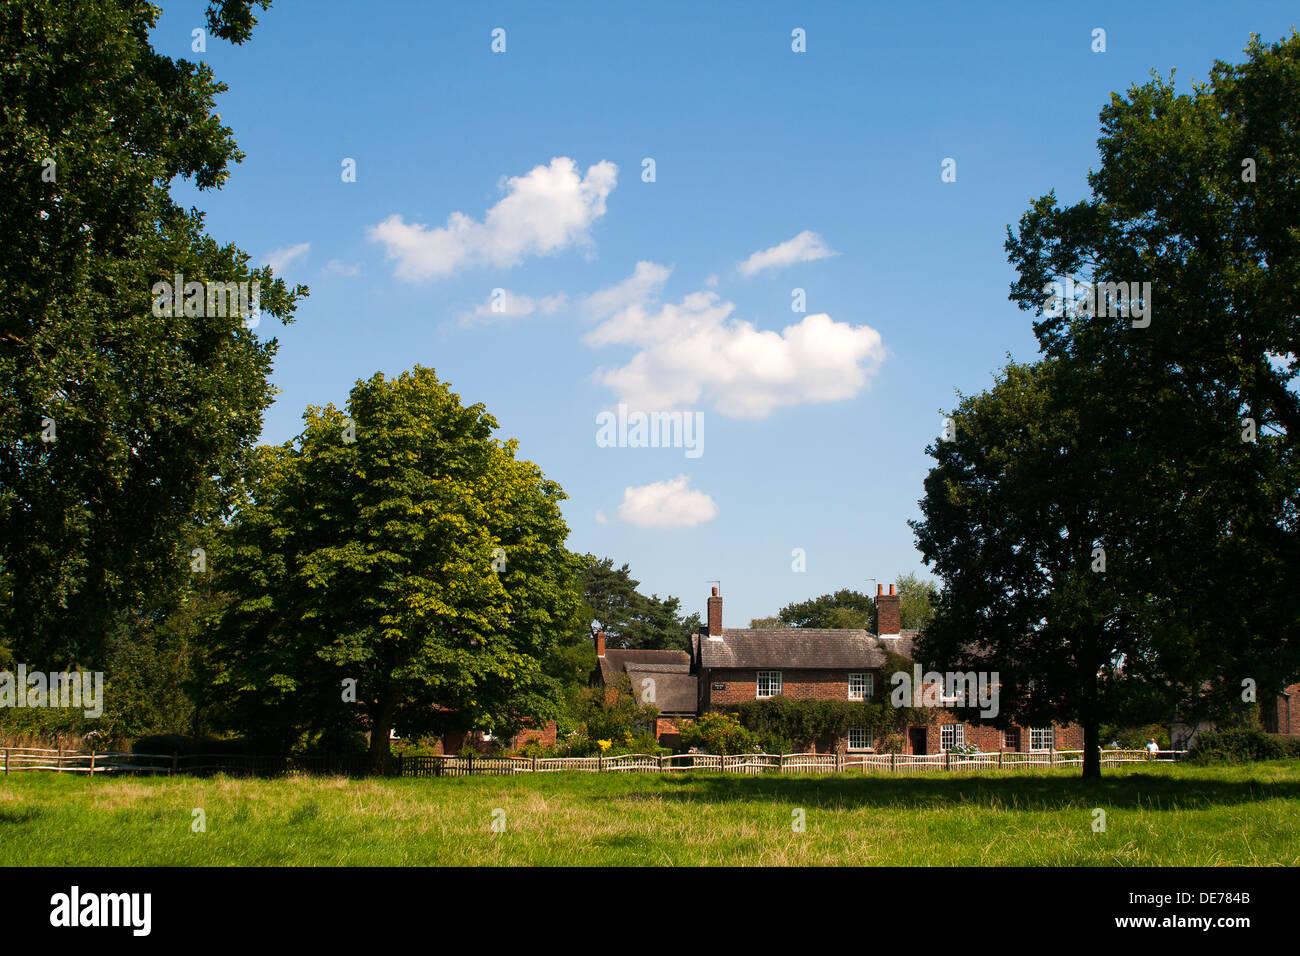 England, Cheshire, Styal Village cottages - Stock Image